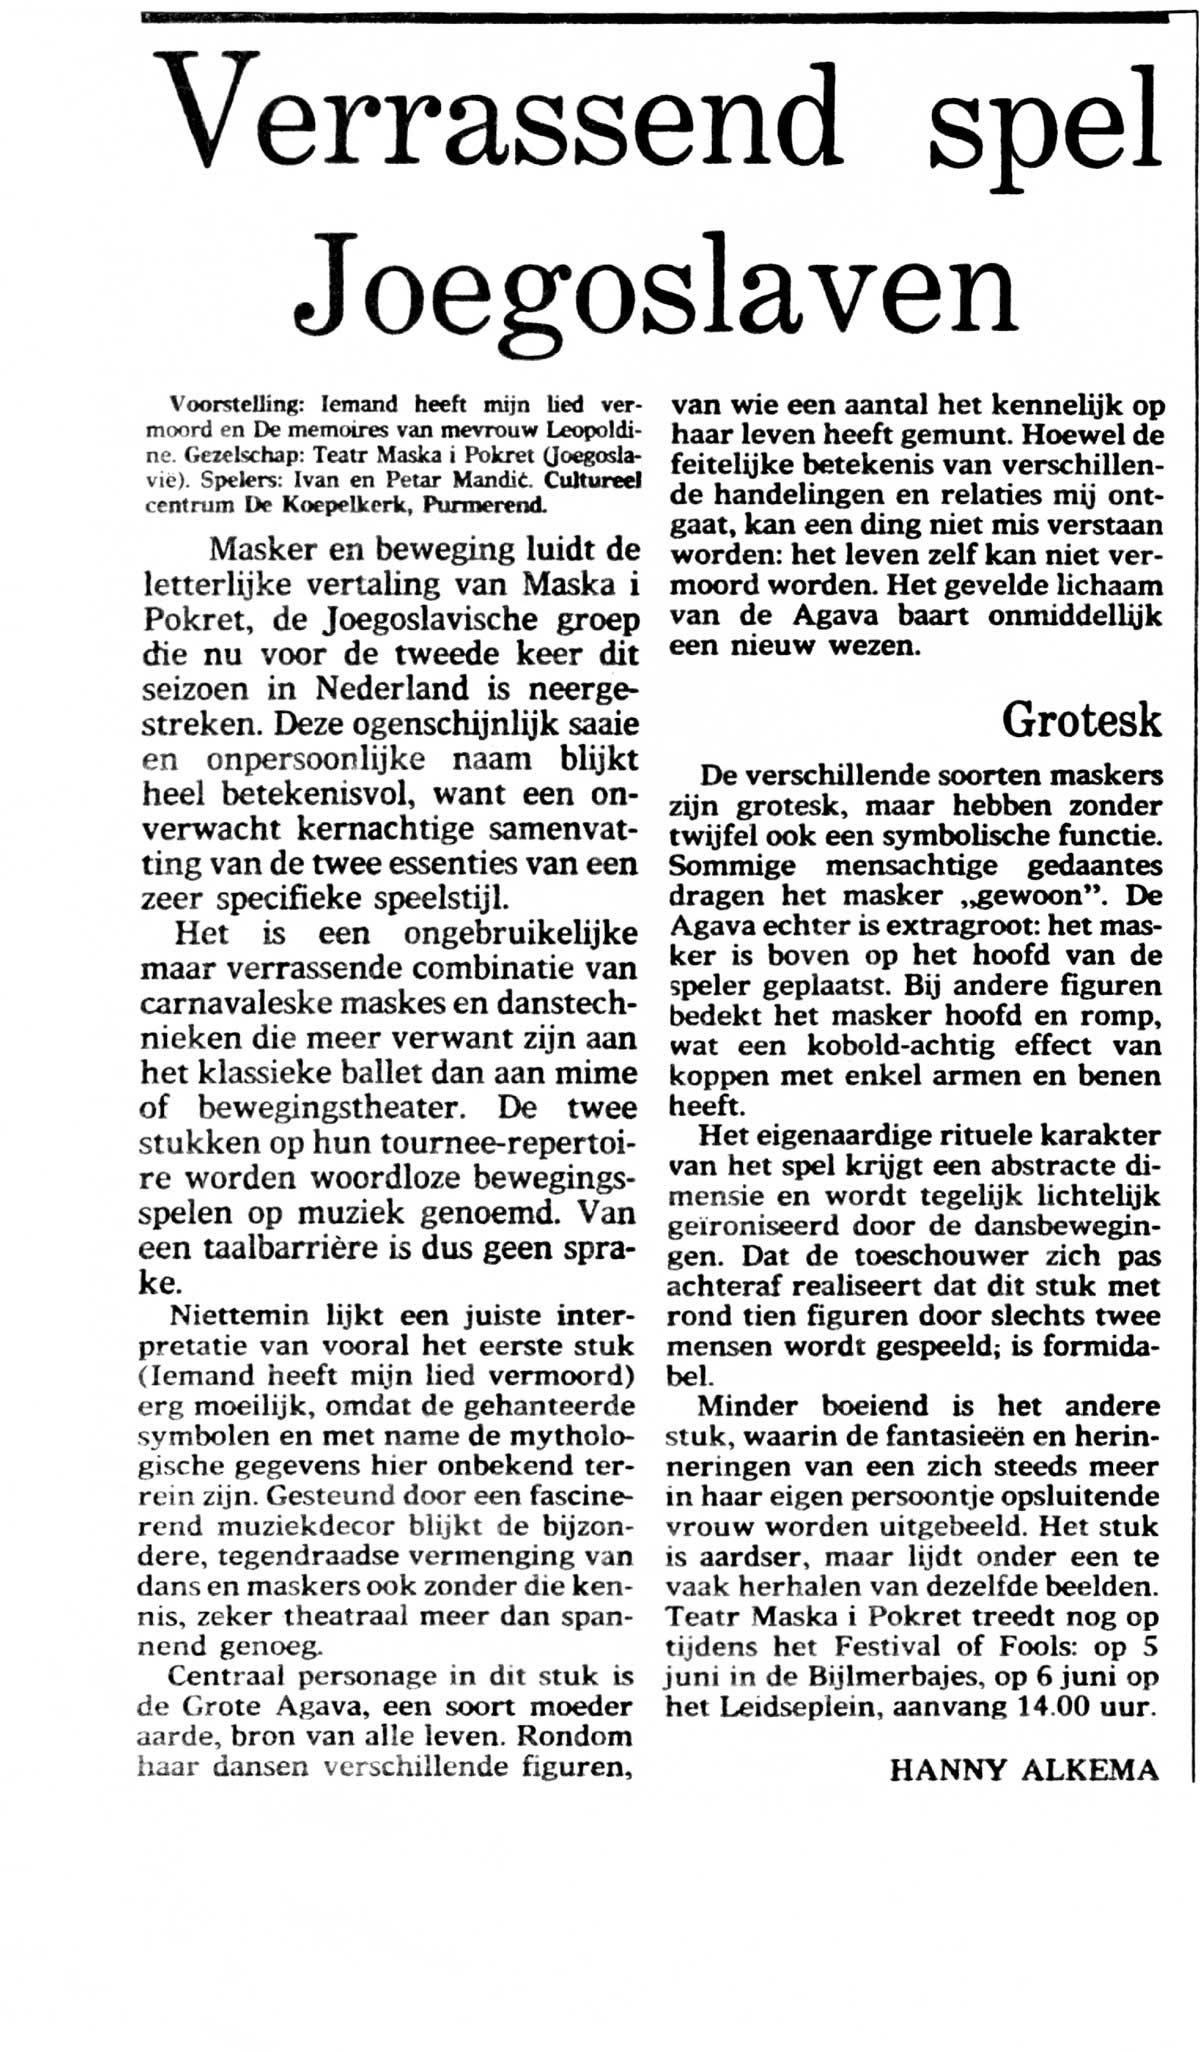 Press: Theatre Maska i Pokret - Somebody has Killed the Play - SURPRISING PLAY OF THE YUGOSLAVS - Hanny Alkema